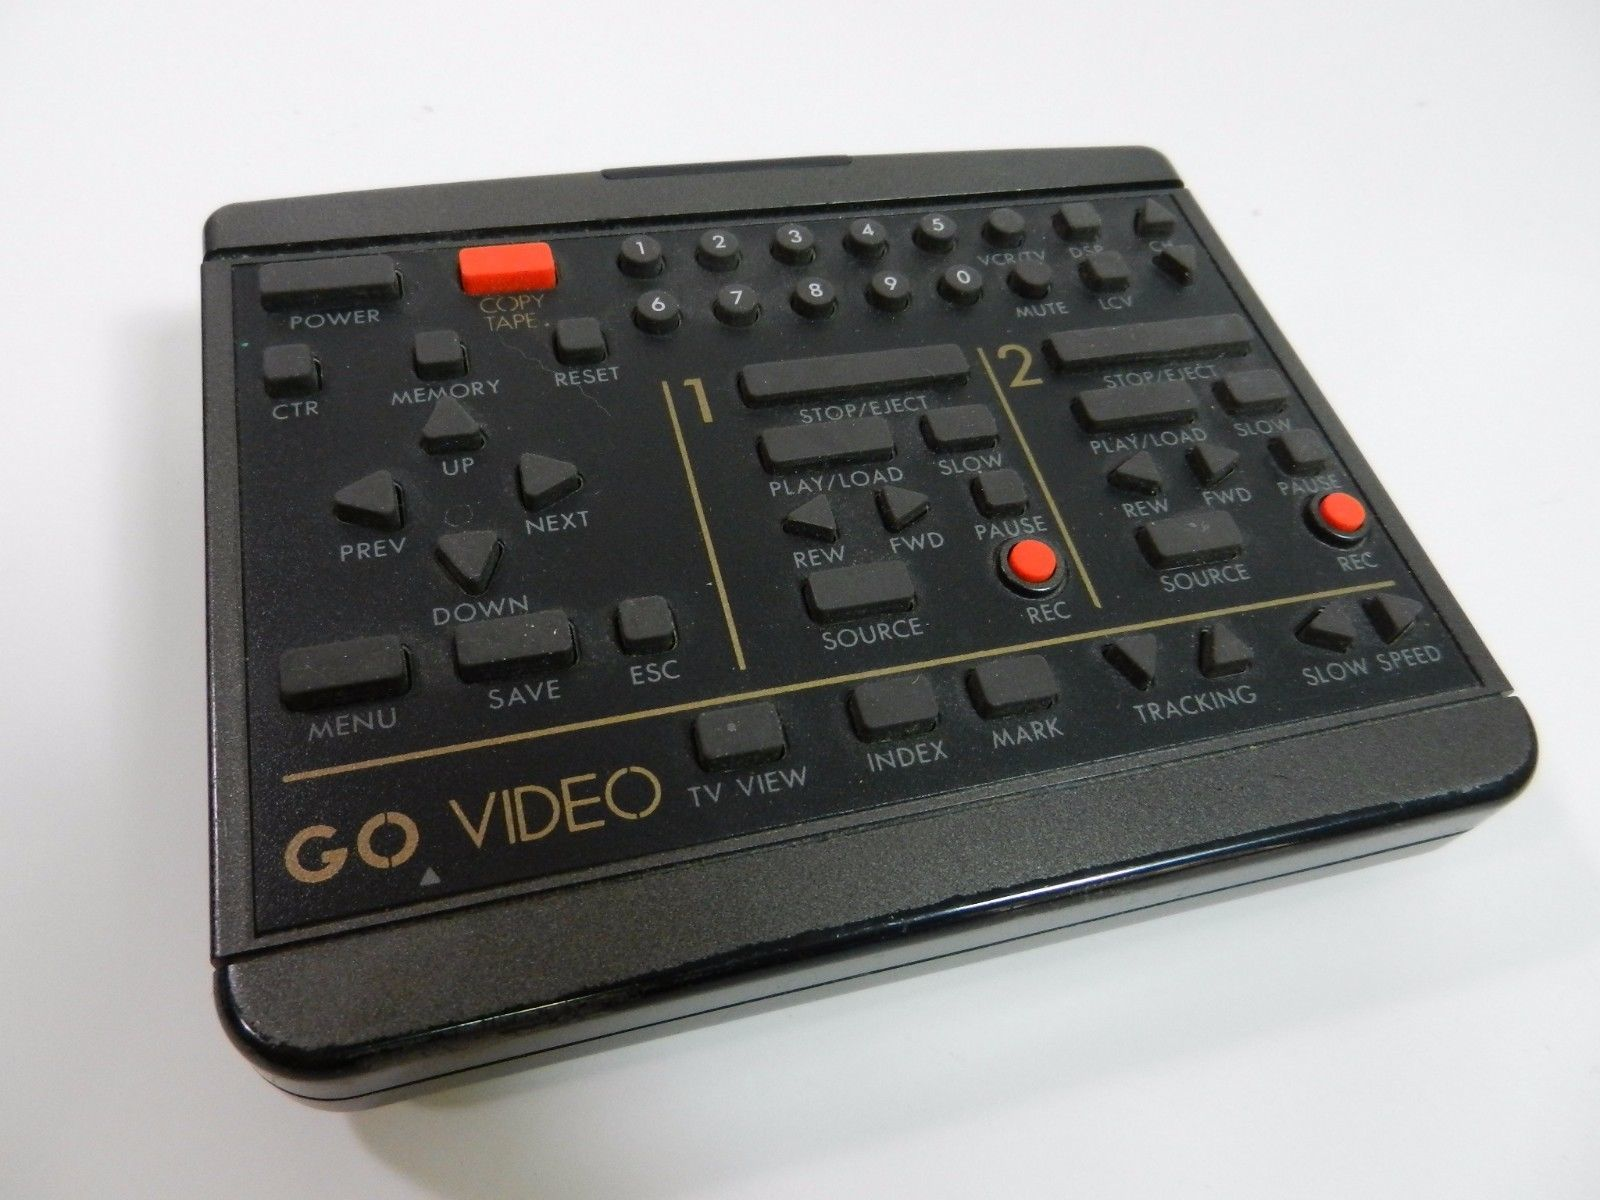 Horizon Go Video GV-3050 Remote Control Dual and similar items